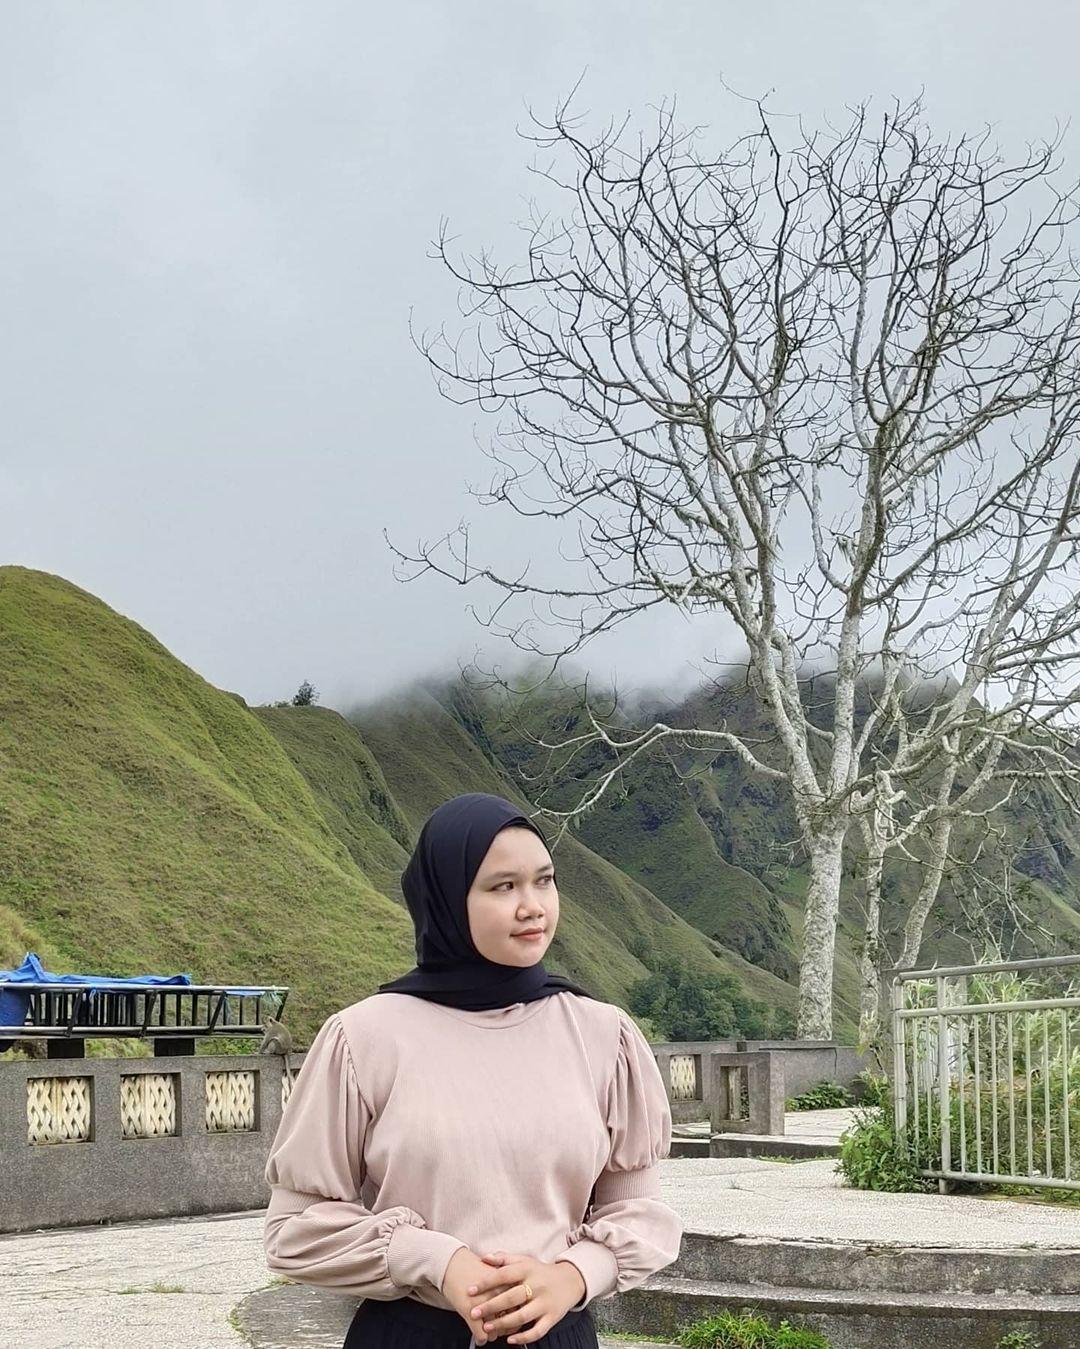 Taman Wisata Pusuk Sembalun Lombok Populer 2021